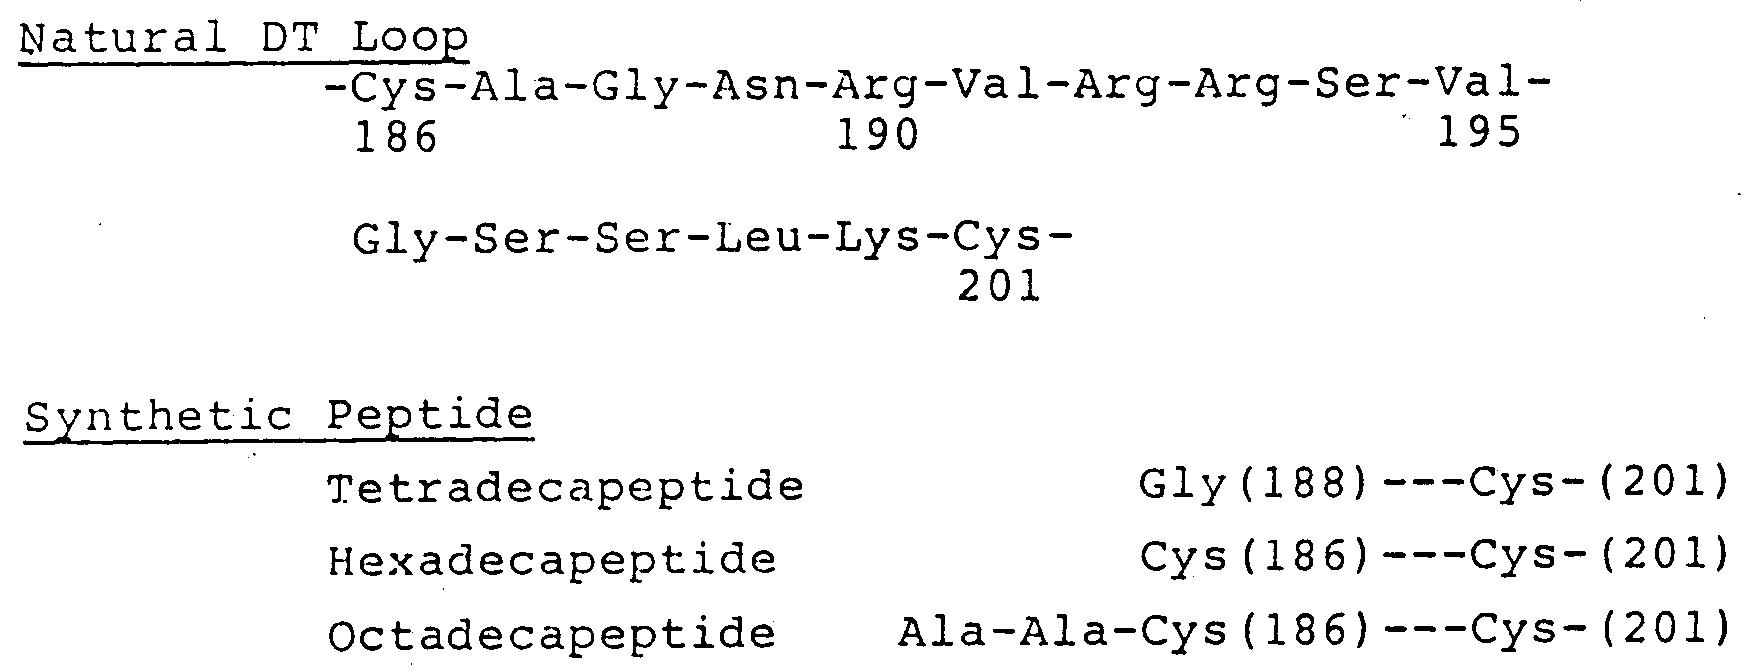 Patent EPA Pre S Gene Codes Peptide Hepatitis B Imgb EPA?clen